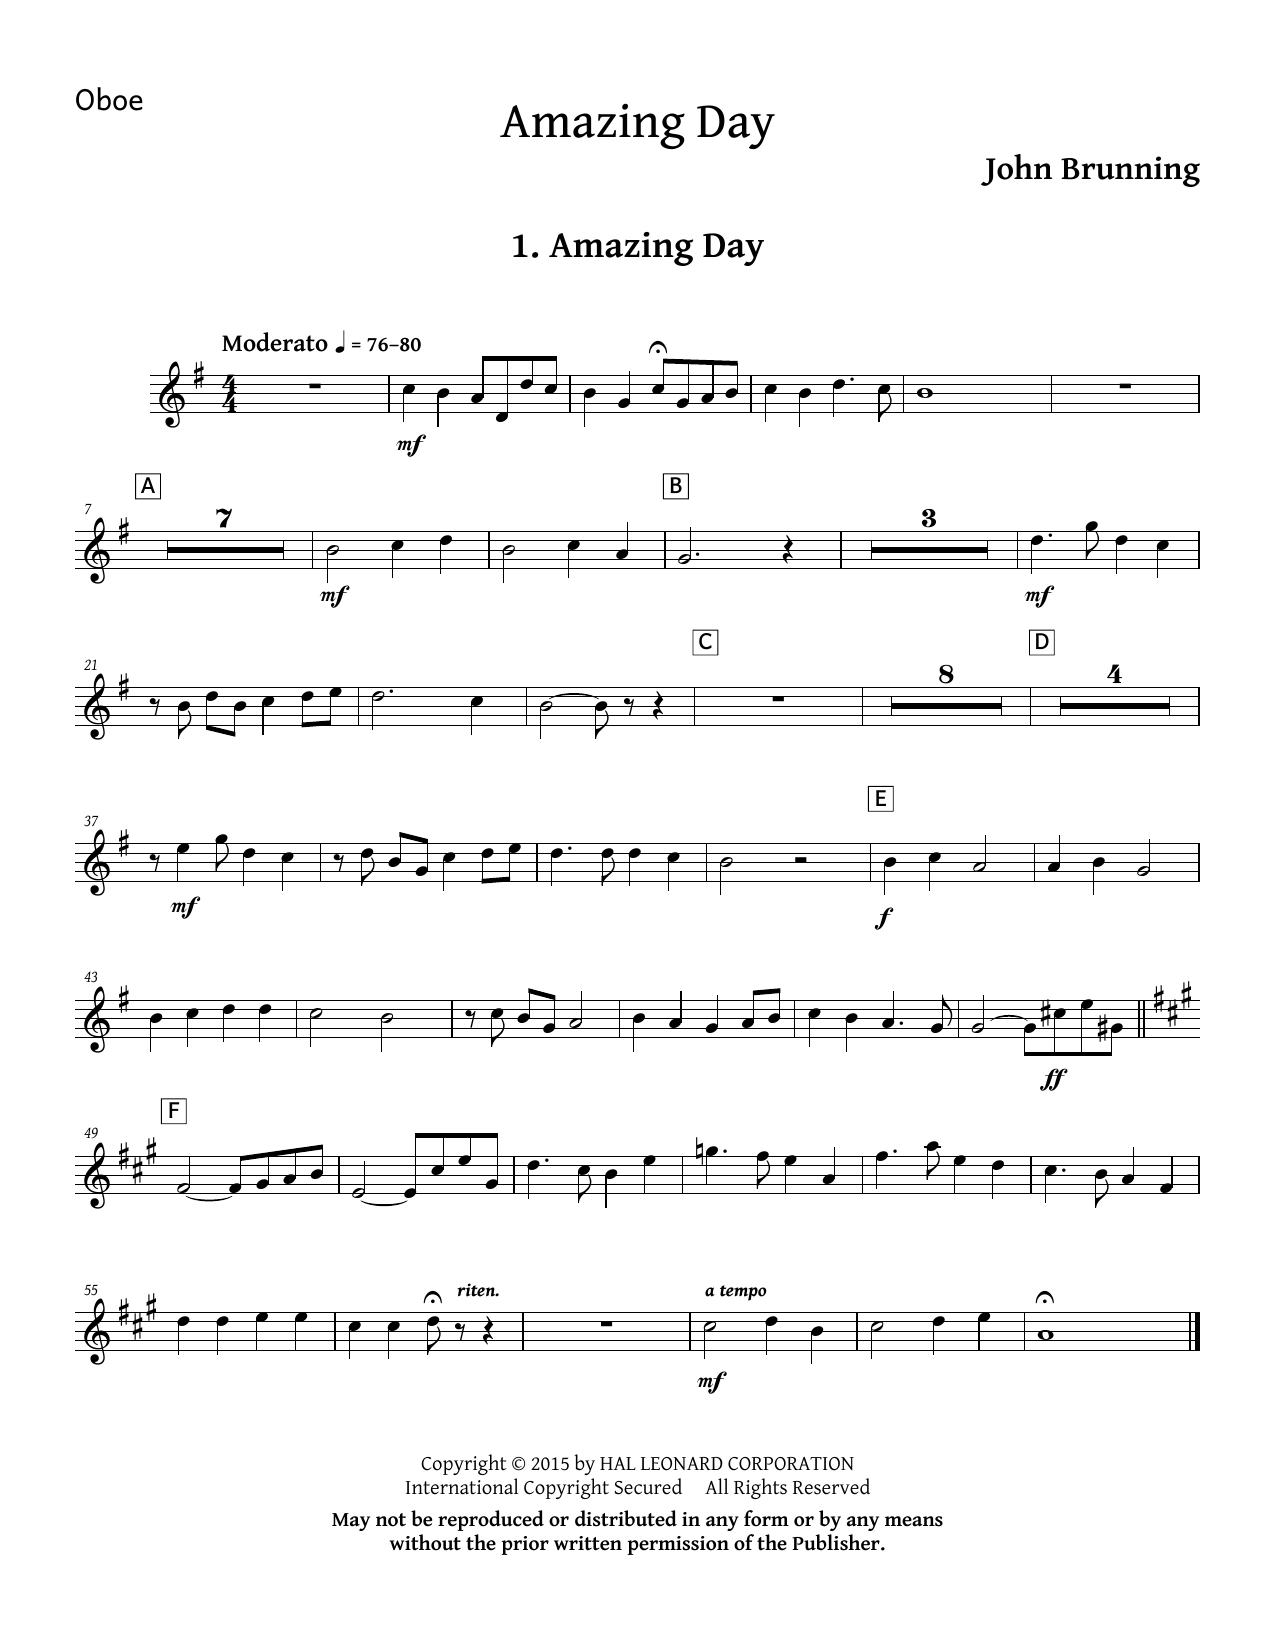 Amazing Day - Oboe Sheet Music